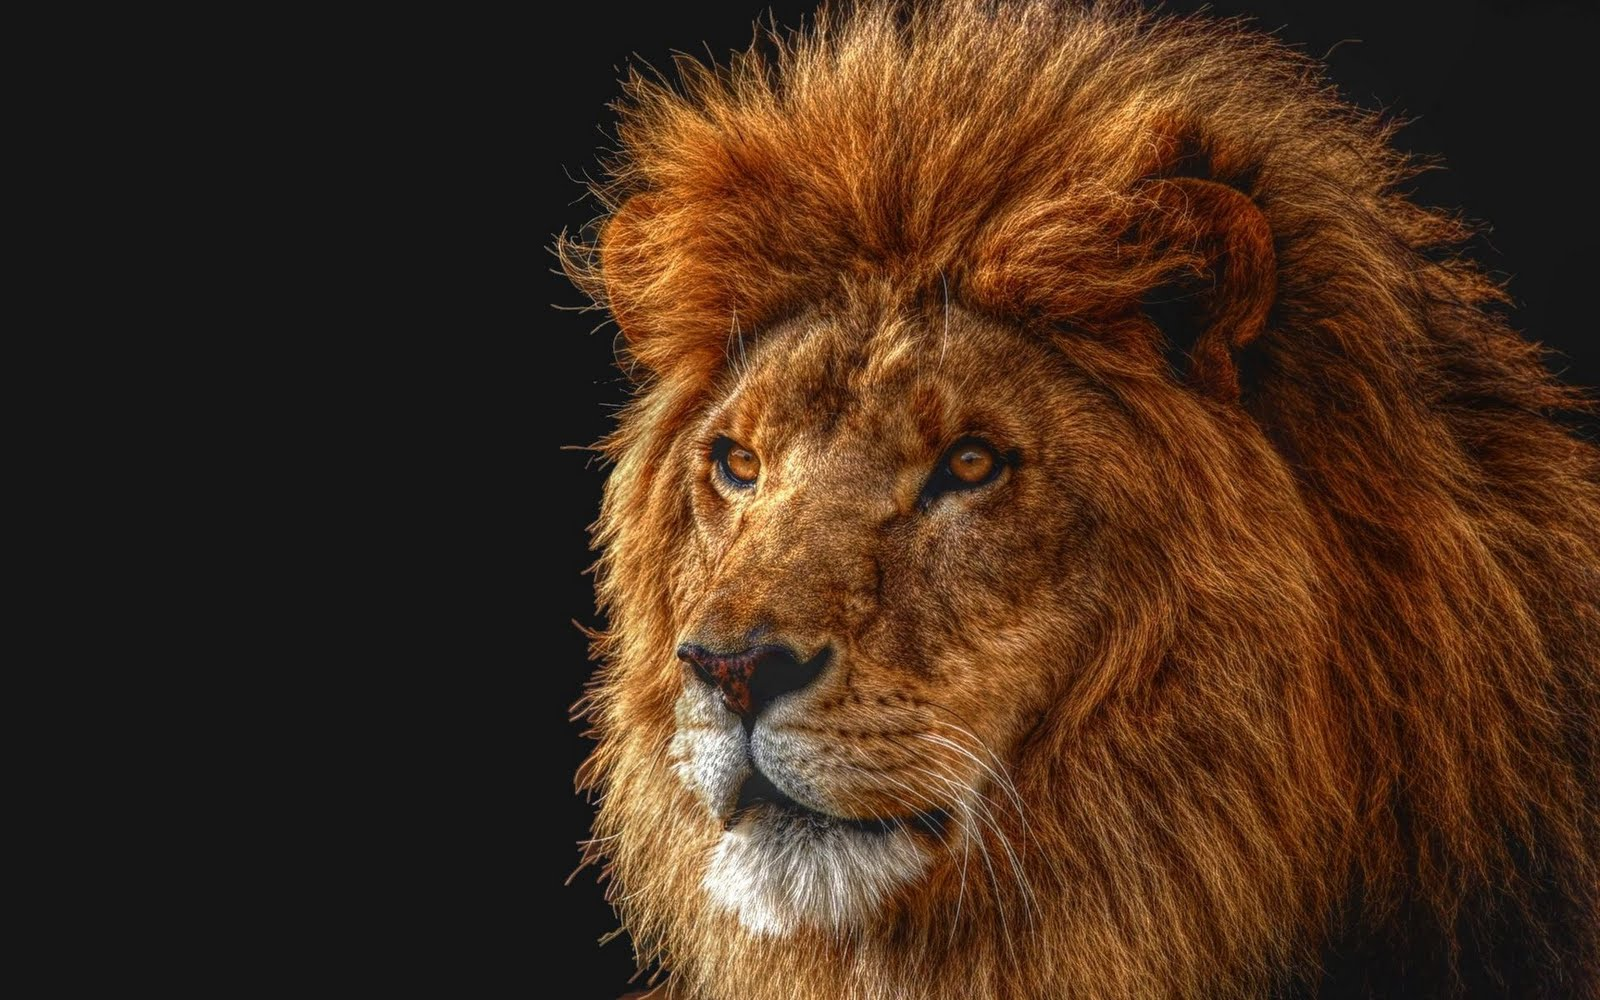 http://3.bp.blogspot.com/-Jw1pckruMEM/TkAZ8_RPmBI/AAAAAAAACEY/w2lPNTcruPk/s1600/cheetah+%252817%2529.jpg